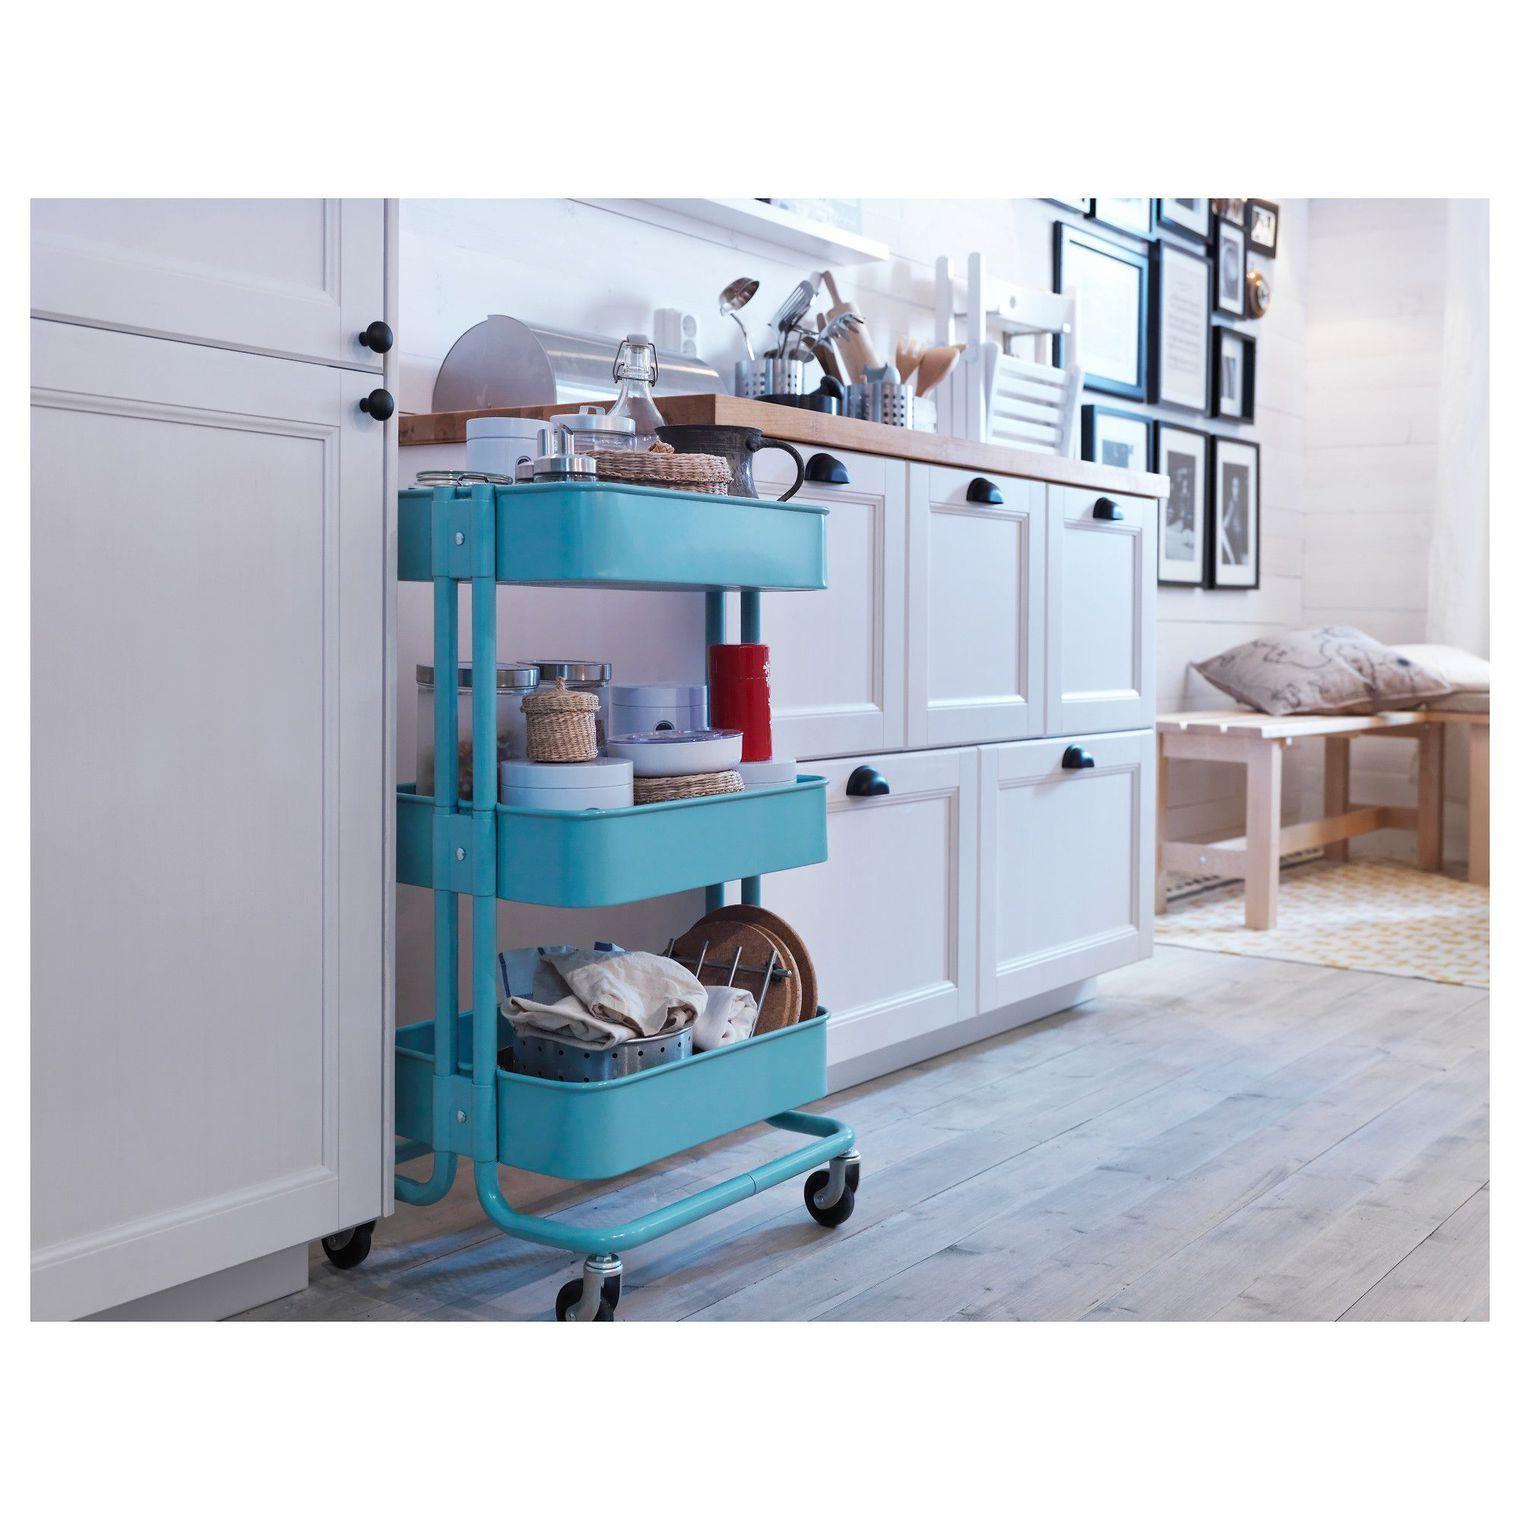 Ikea Raskog : 5 façons de l\'utiliser | Atelier and Interiors